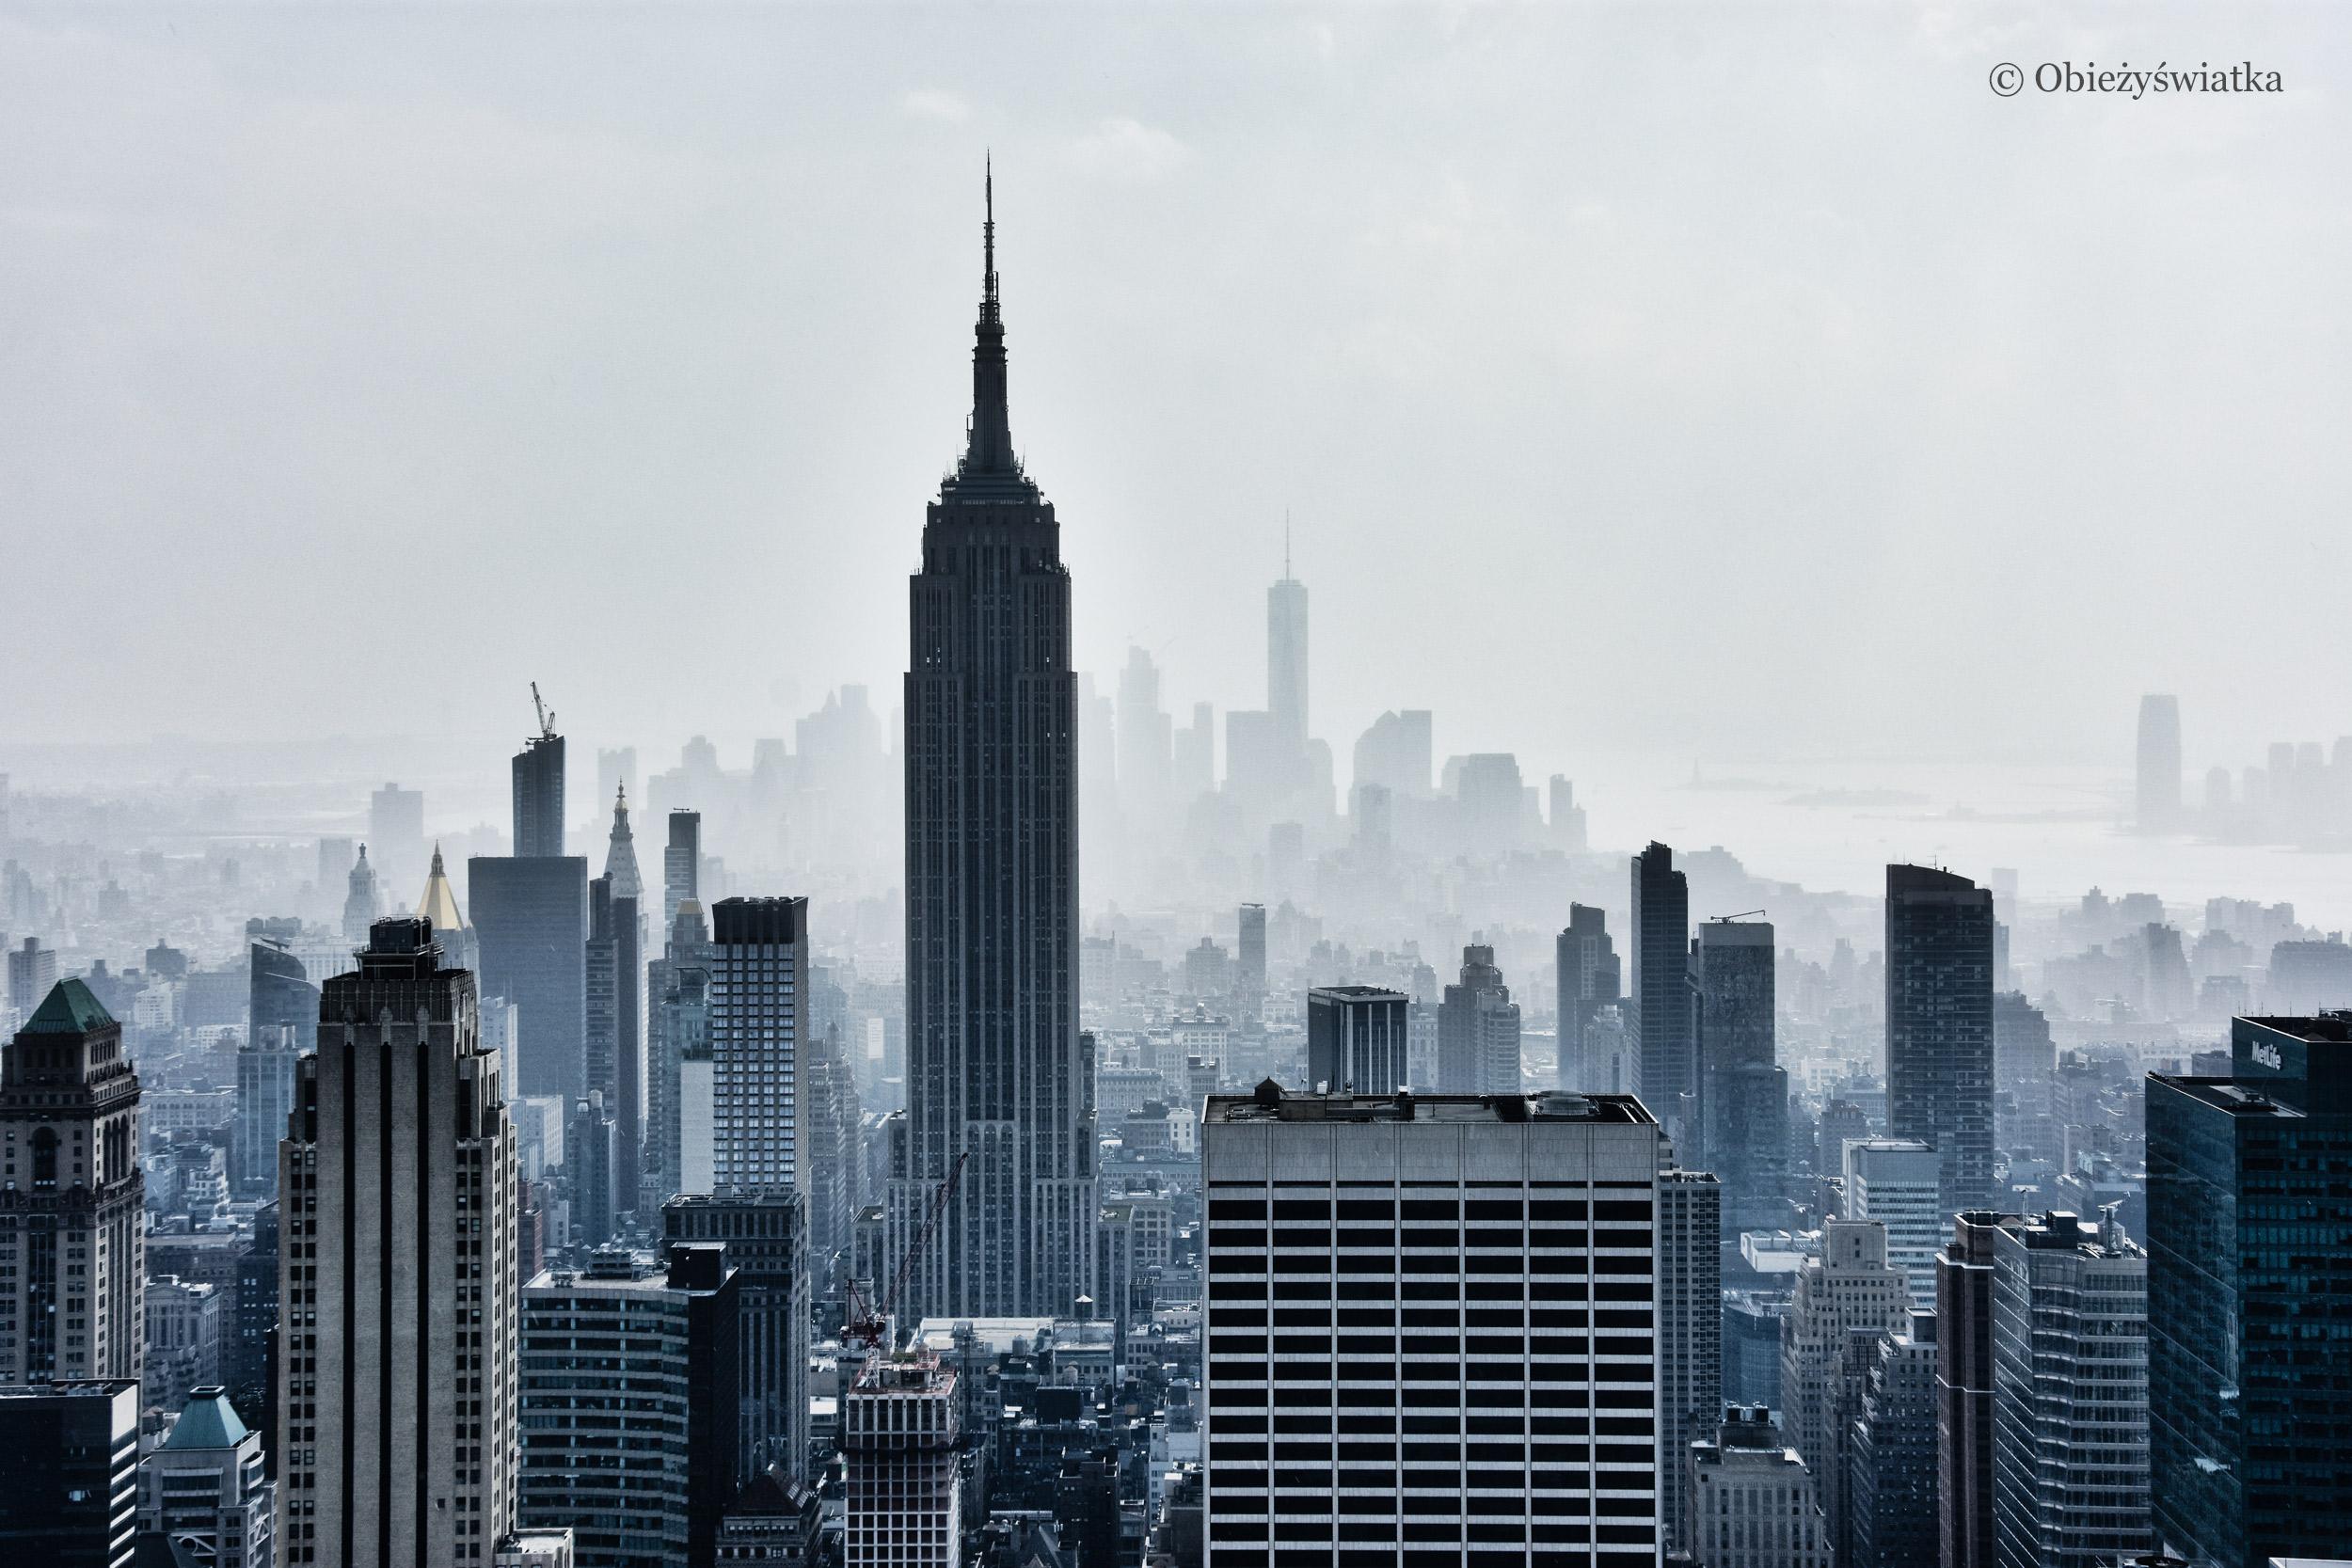 Nowy Jork we mgle